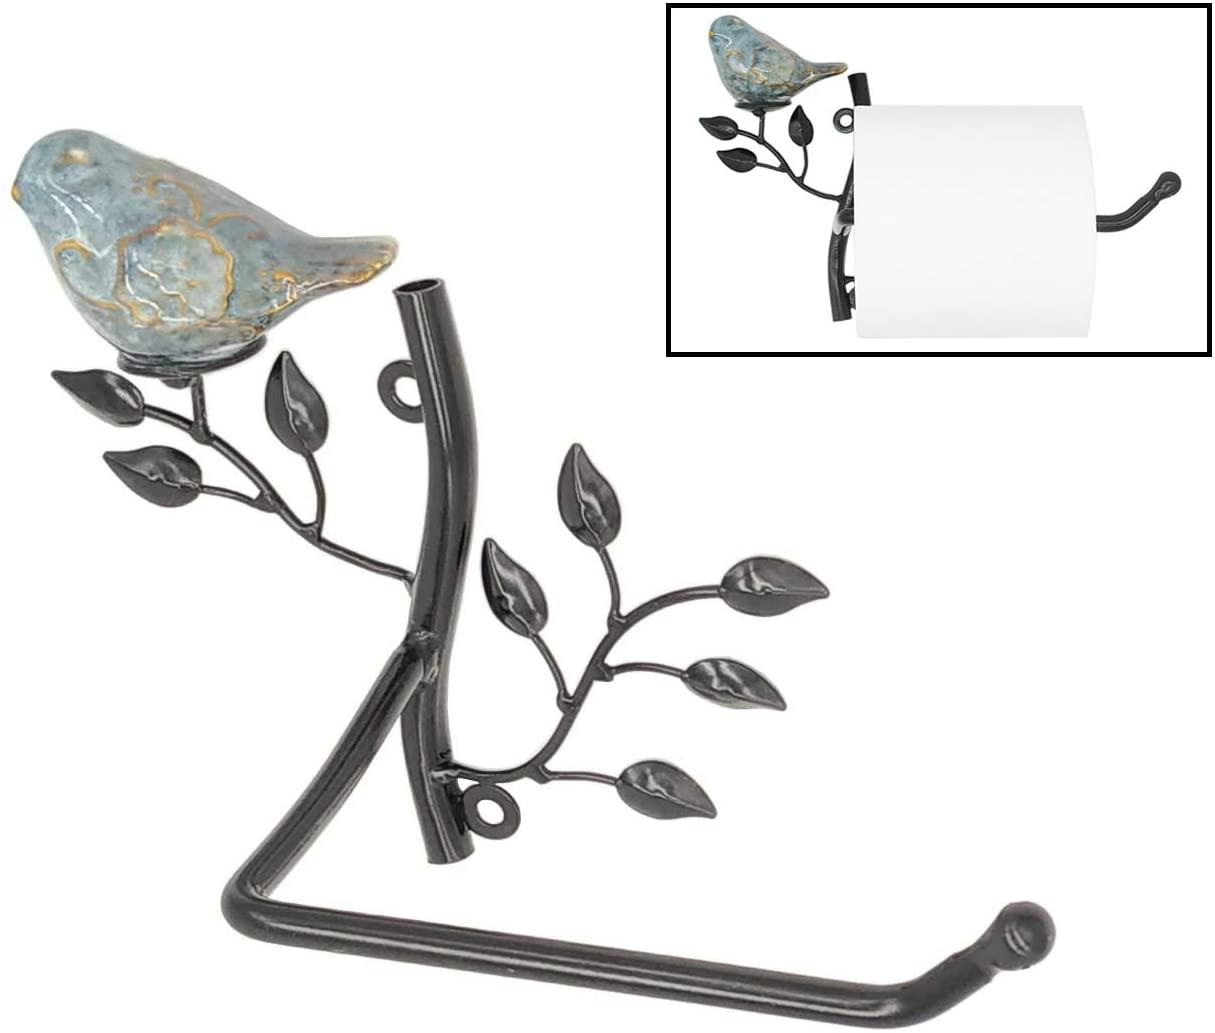 Owlgift Wall Mounted Metal Toilet Tissue Holder w/Ceramic Bird, Roll Organizer for Bathroom – Black